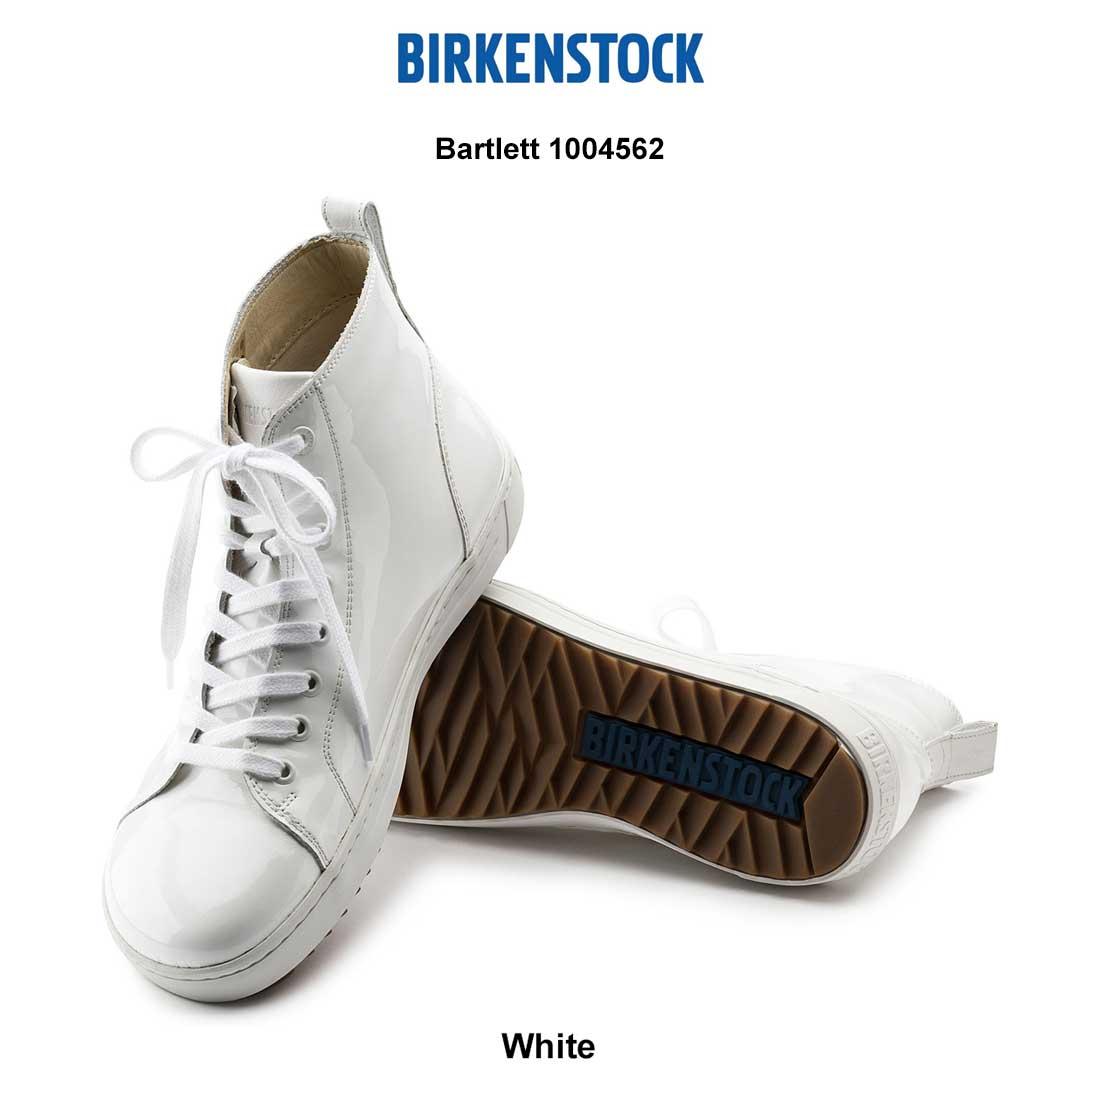 (SALE)BIRKENSTOCK(ビルケンシュトック)レディース ハイカット スニーカー バートレット Bartlett 1004562